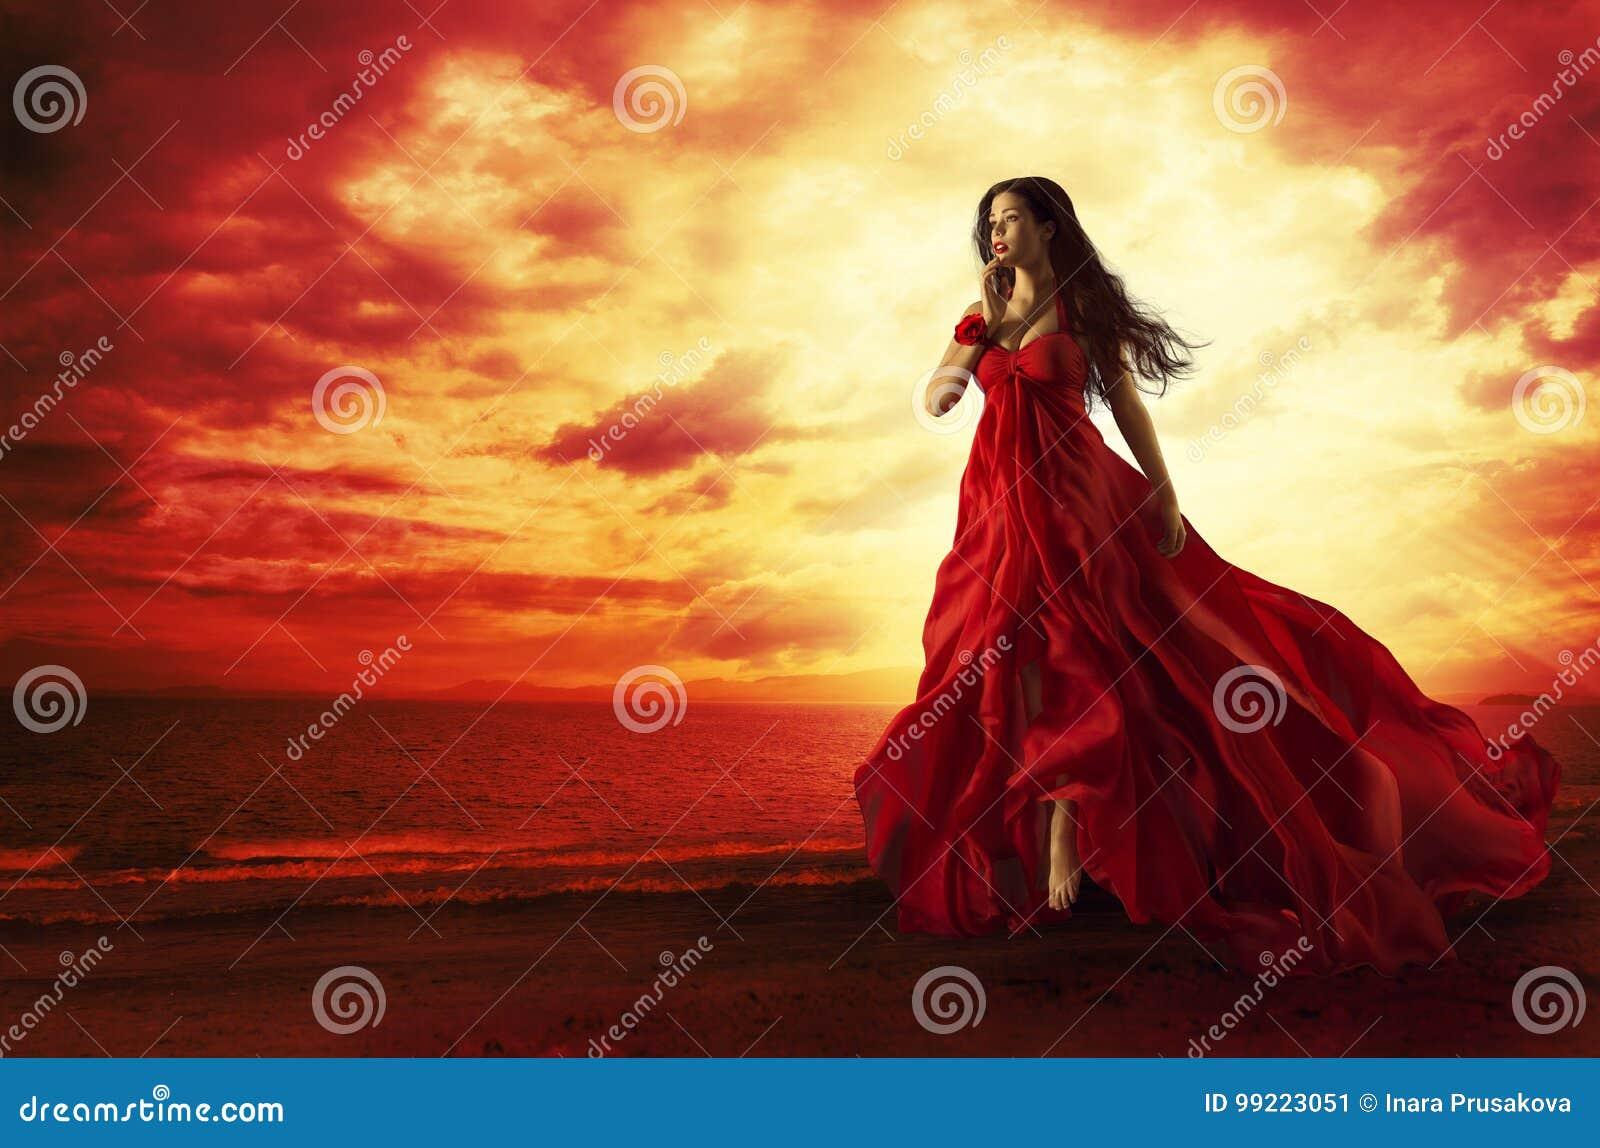 69f4ad4731f6ea Vrouw Die Rode Kleding